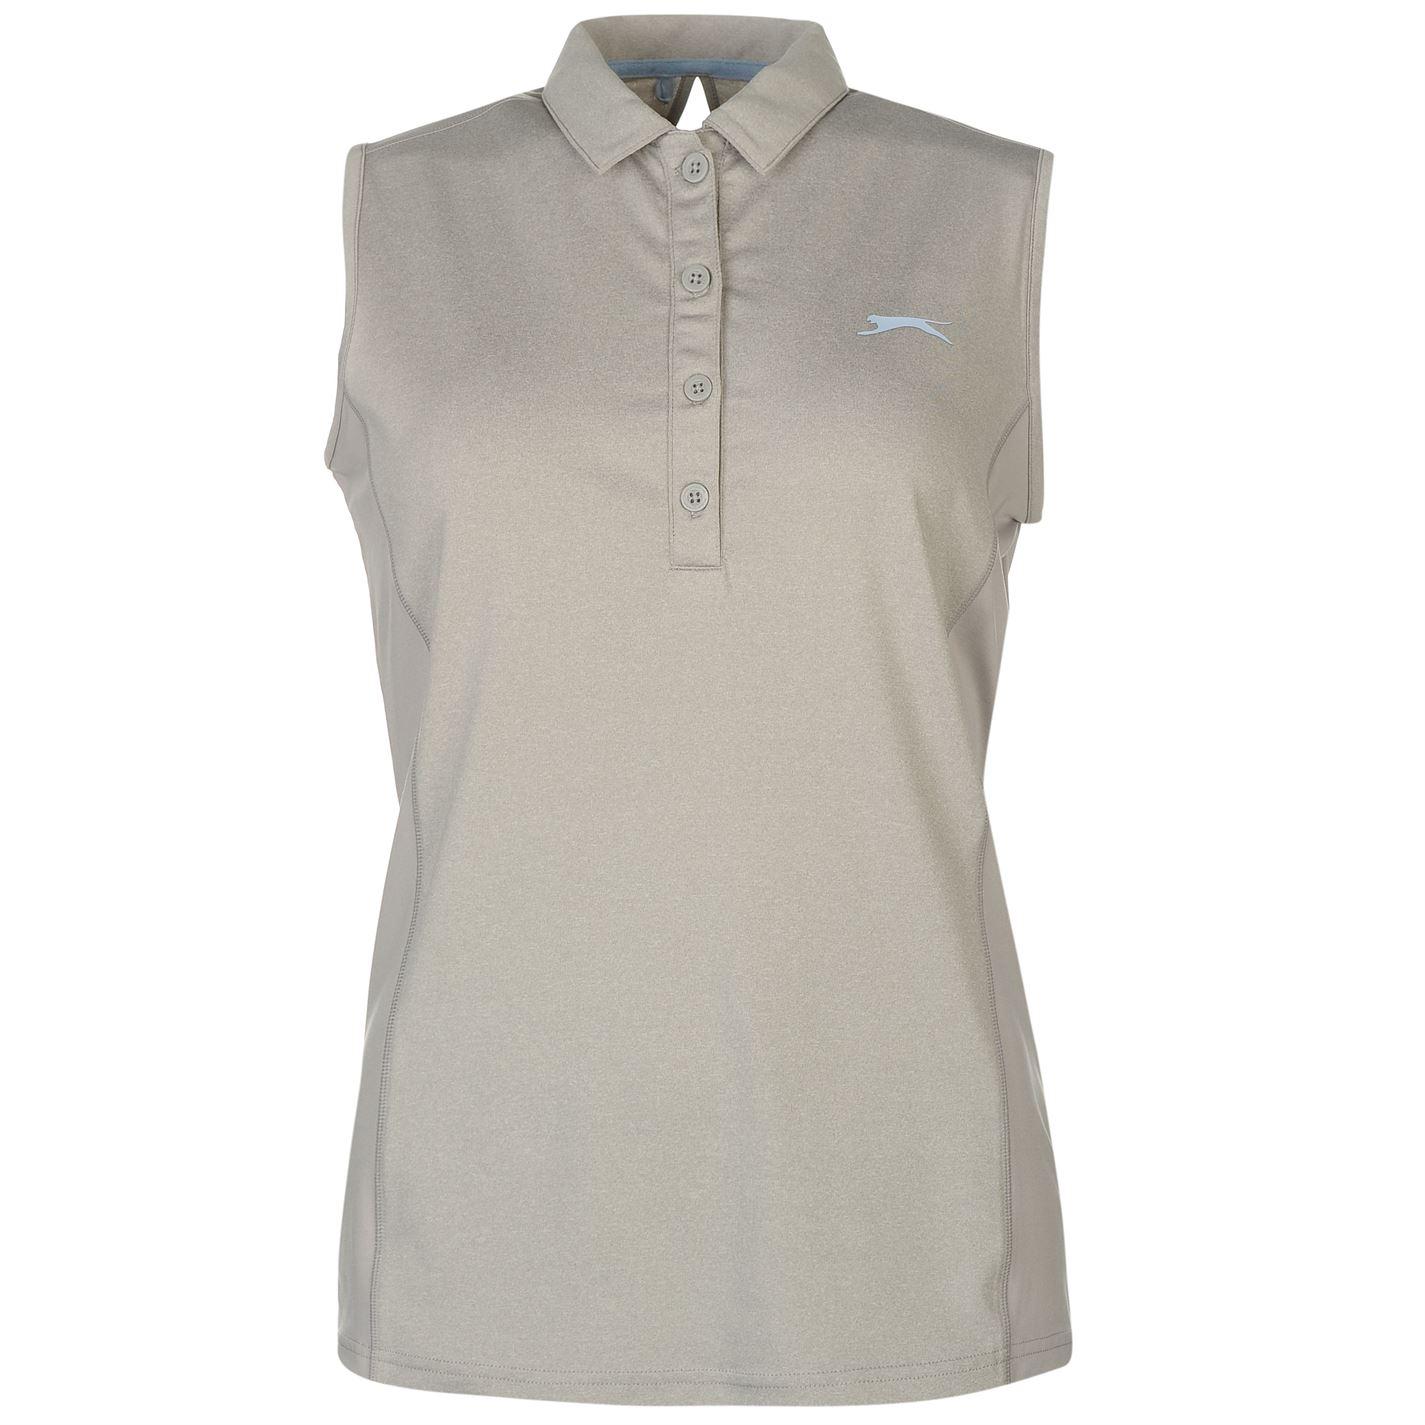 Tricouri Polo Slazenger fara maneci Golf pentru Femei